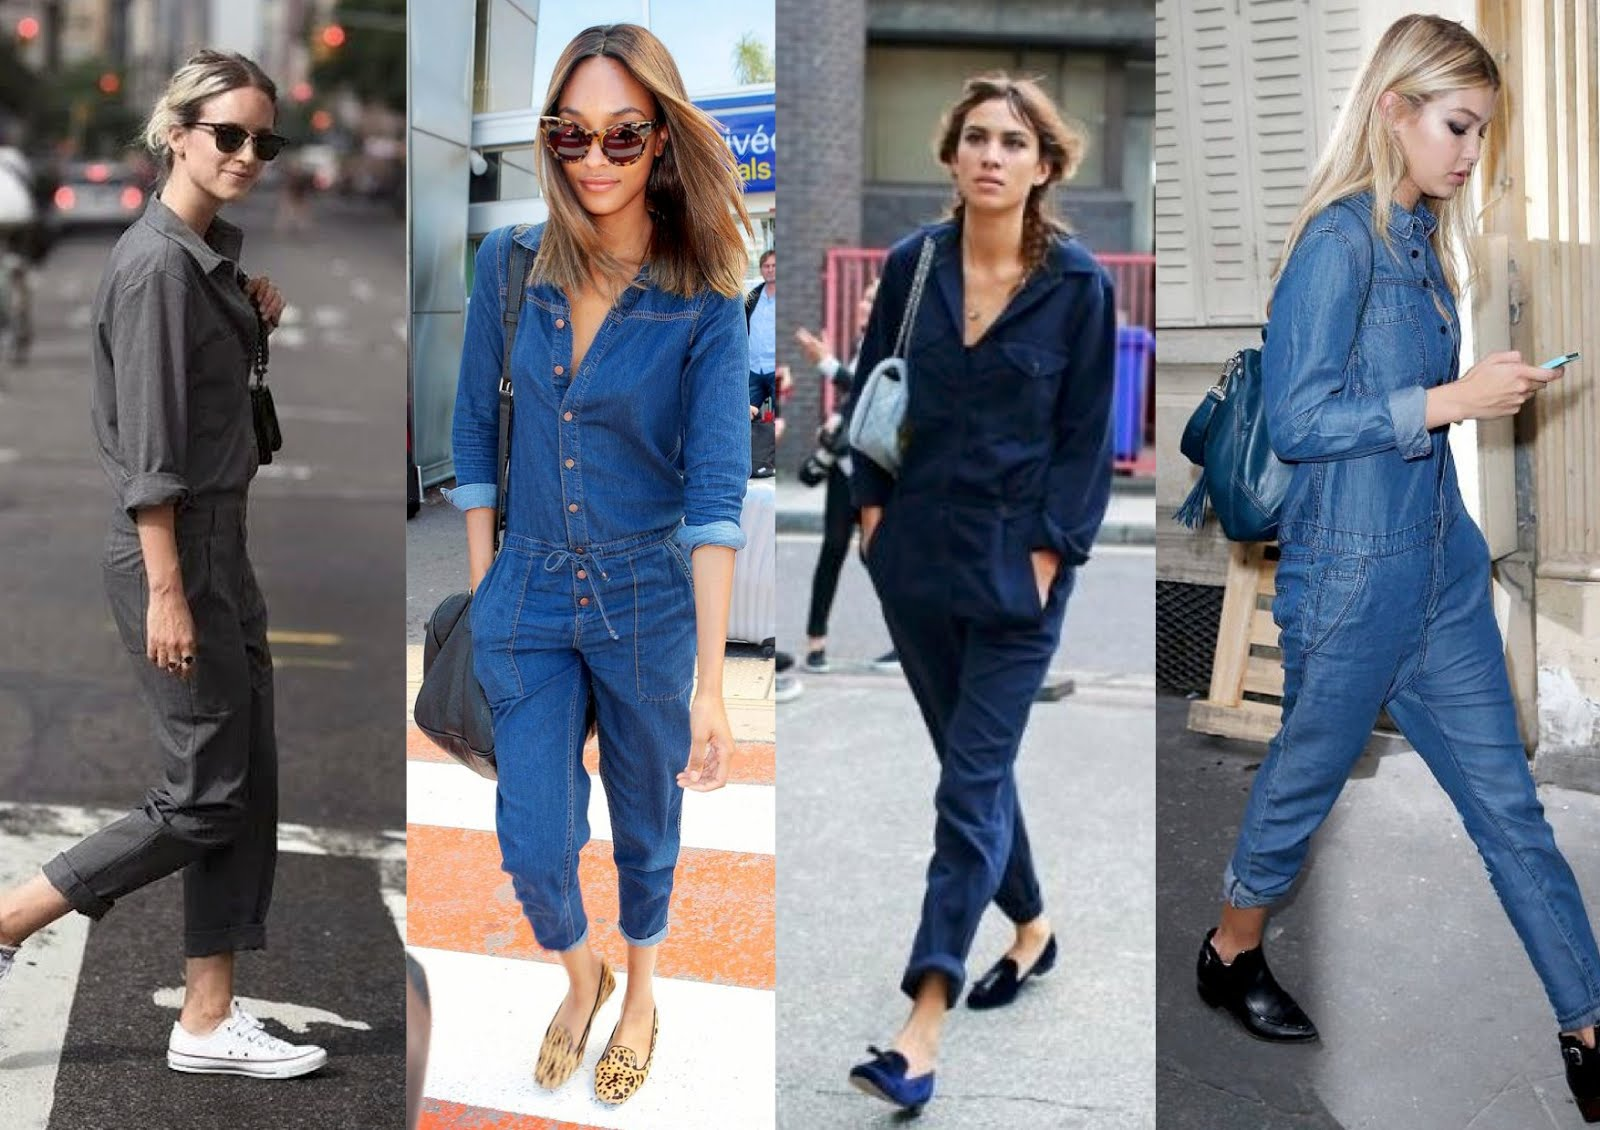 Denim boiler suit trends